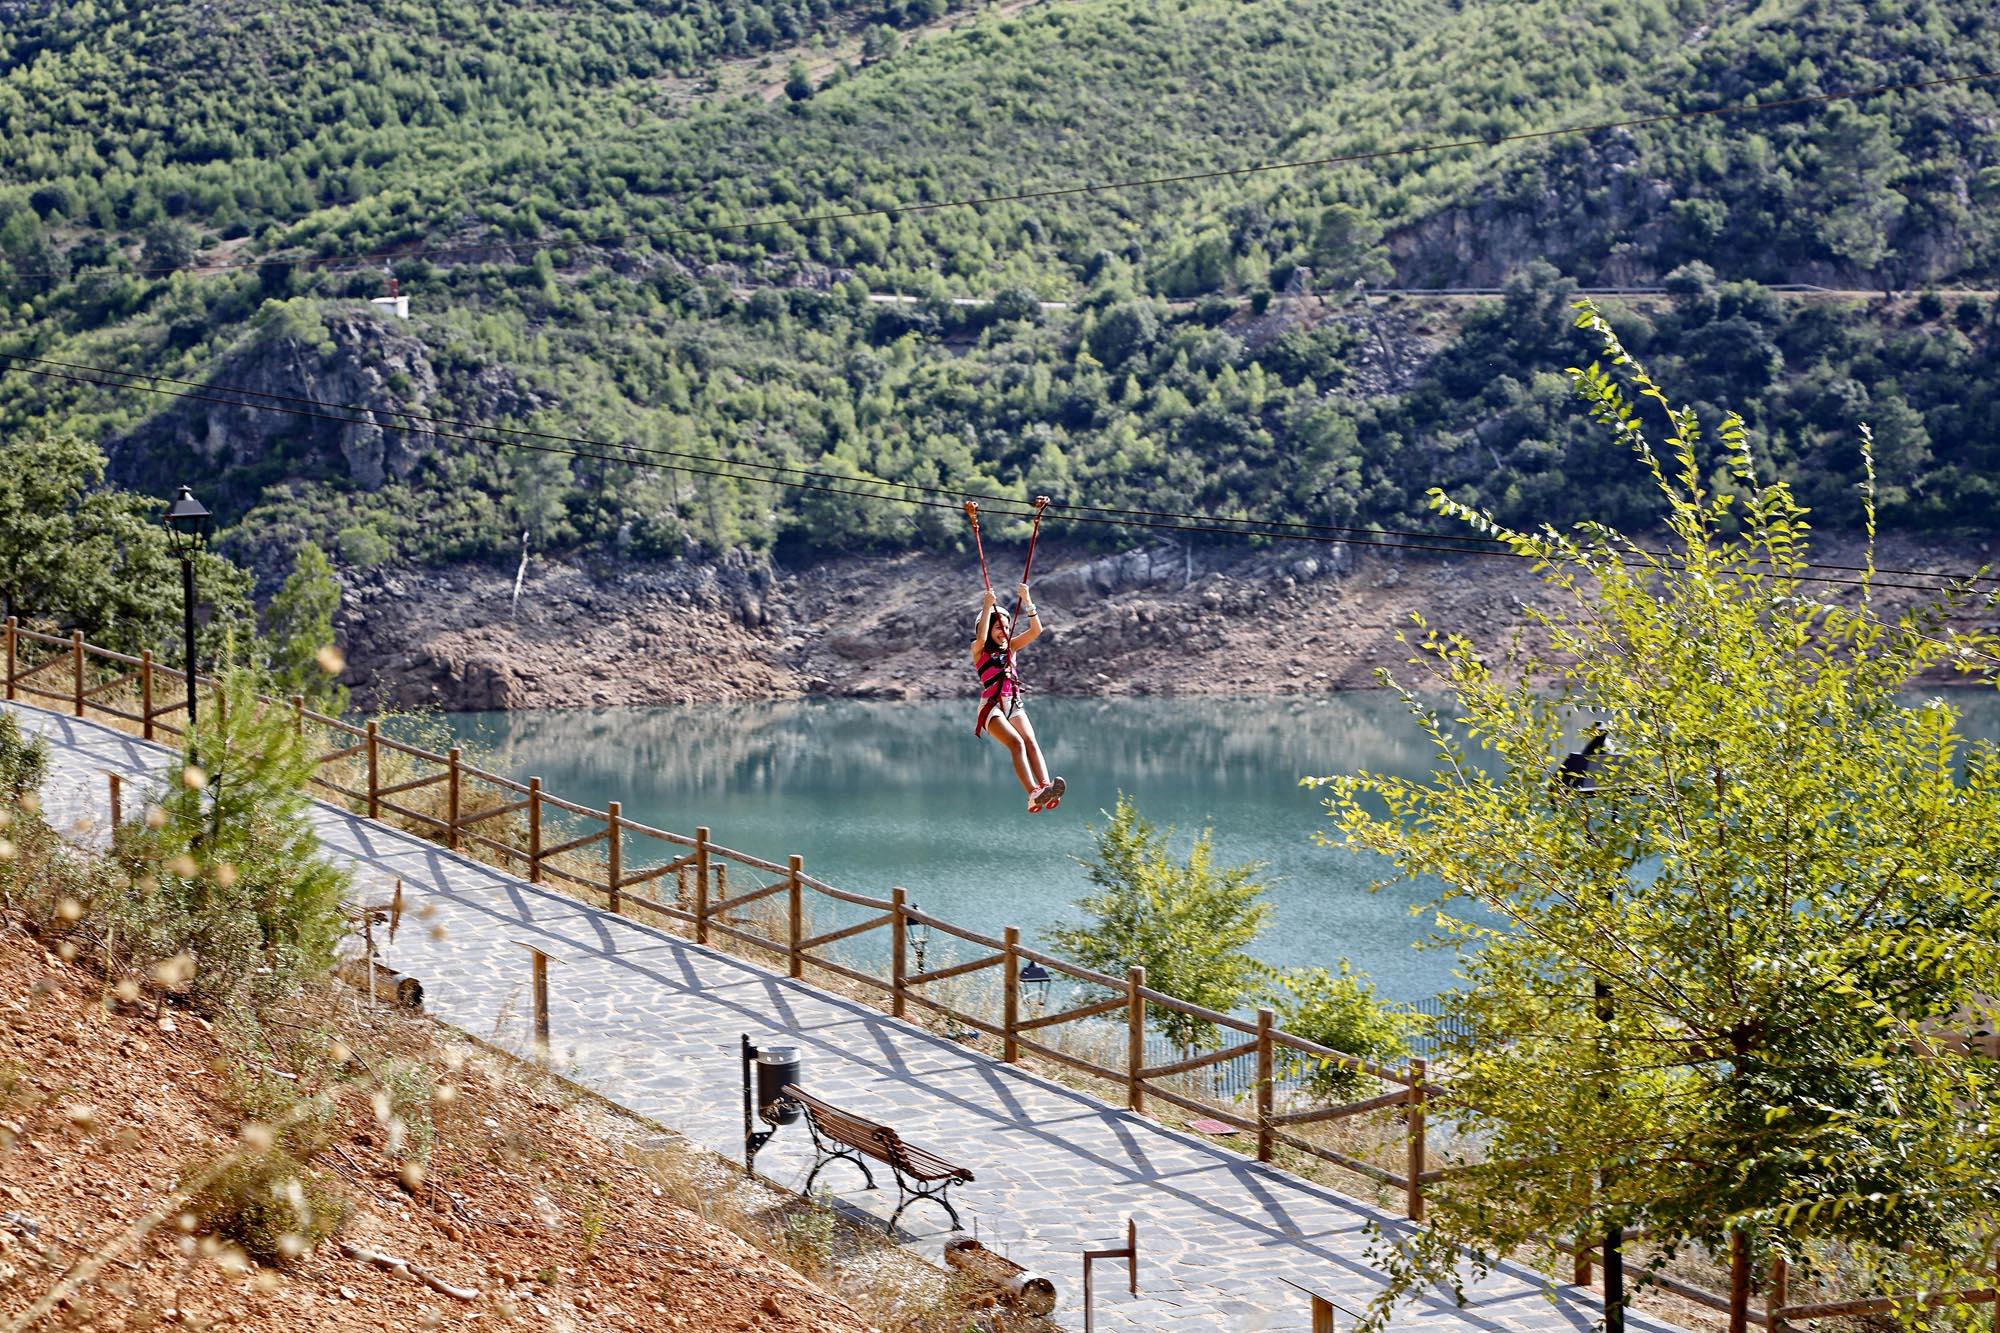 La tirolina ofrece un recorrido de 140 metros junto al pantano por 4 euros.